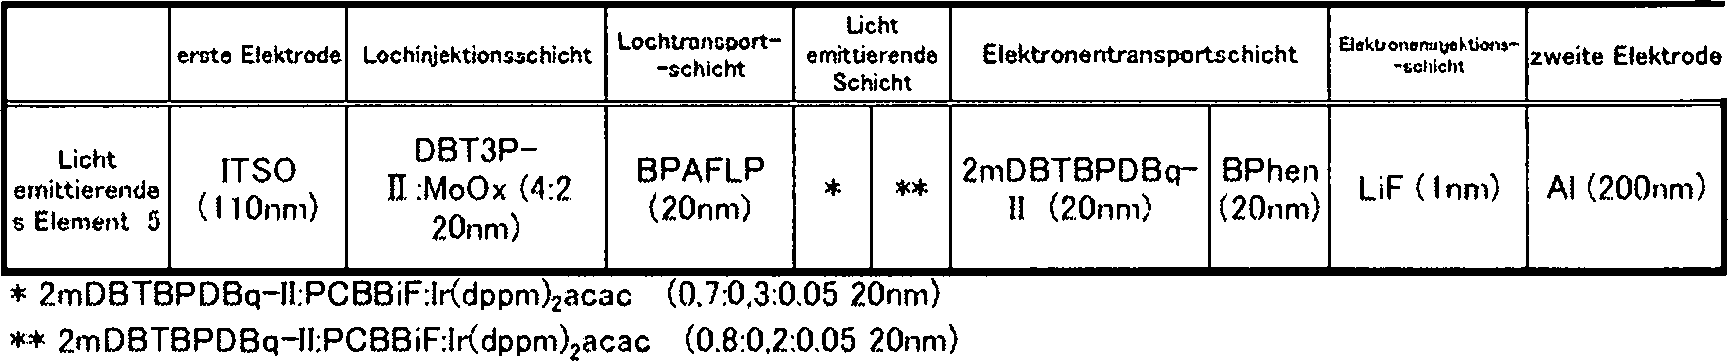 DE112013001439T5 - Light-emitting element, light emitting device